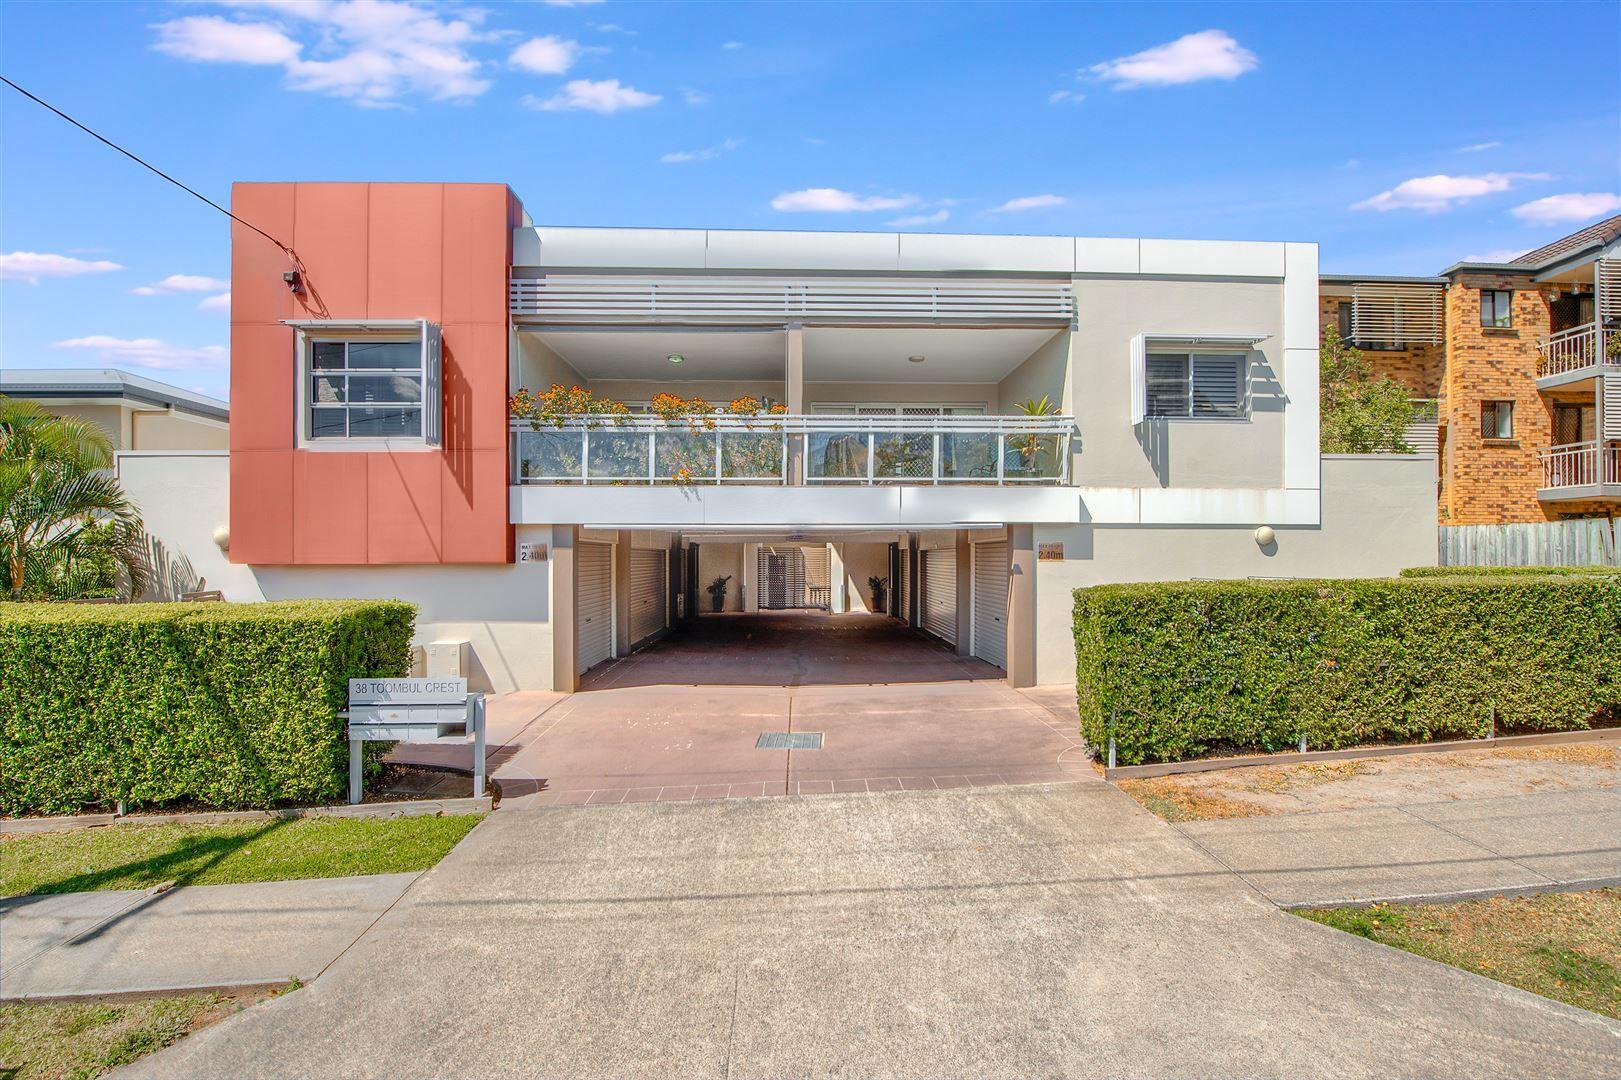 2 bedrooms Apartment / Unit / Flat in 6/38 Toombul Terrace NUNDAH QLD, 4012